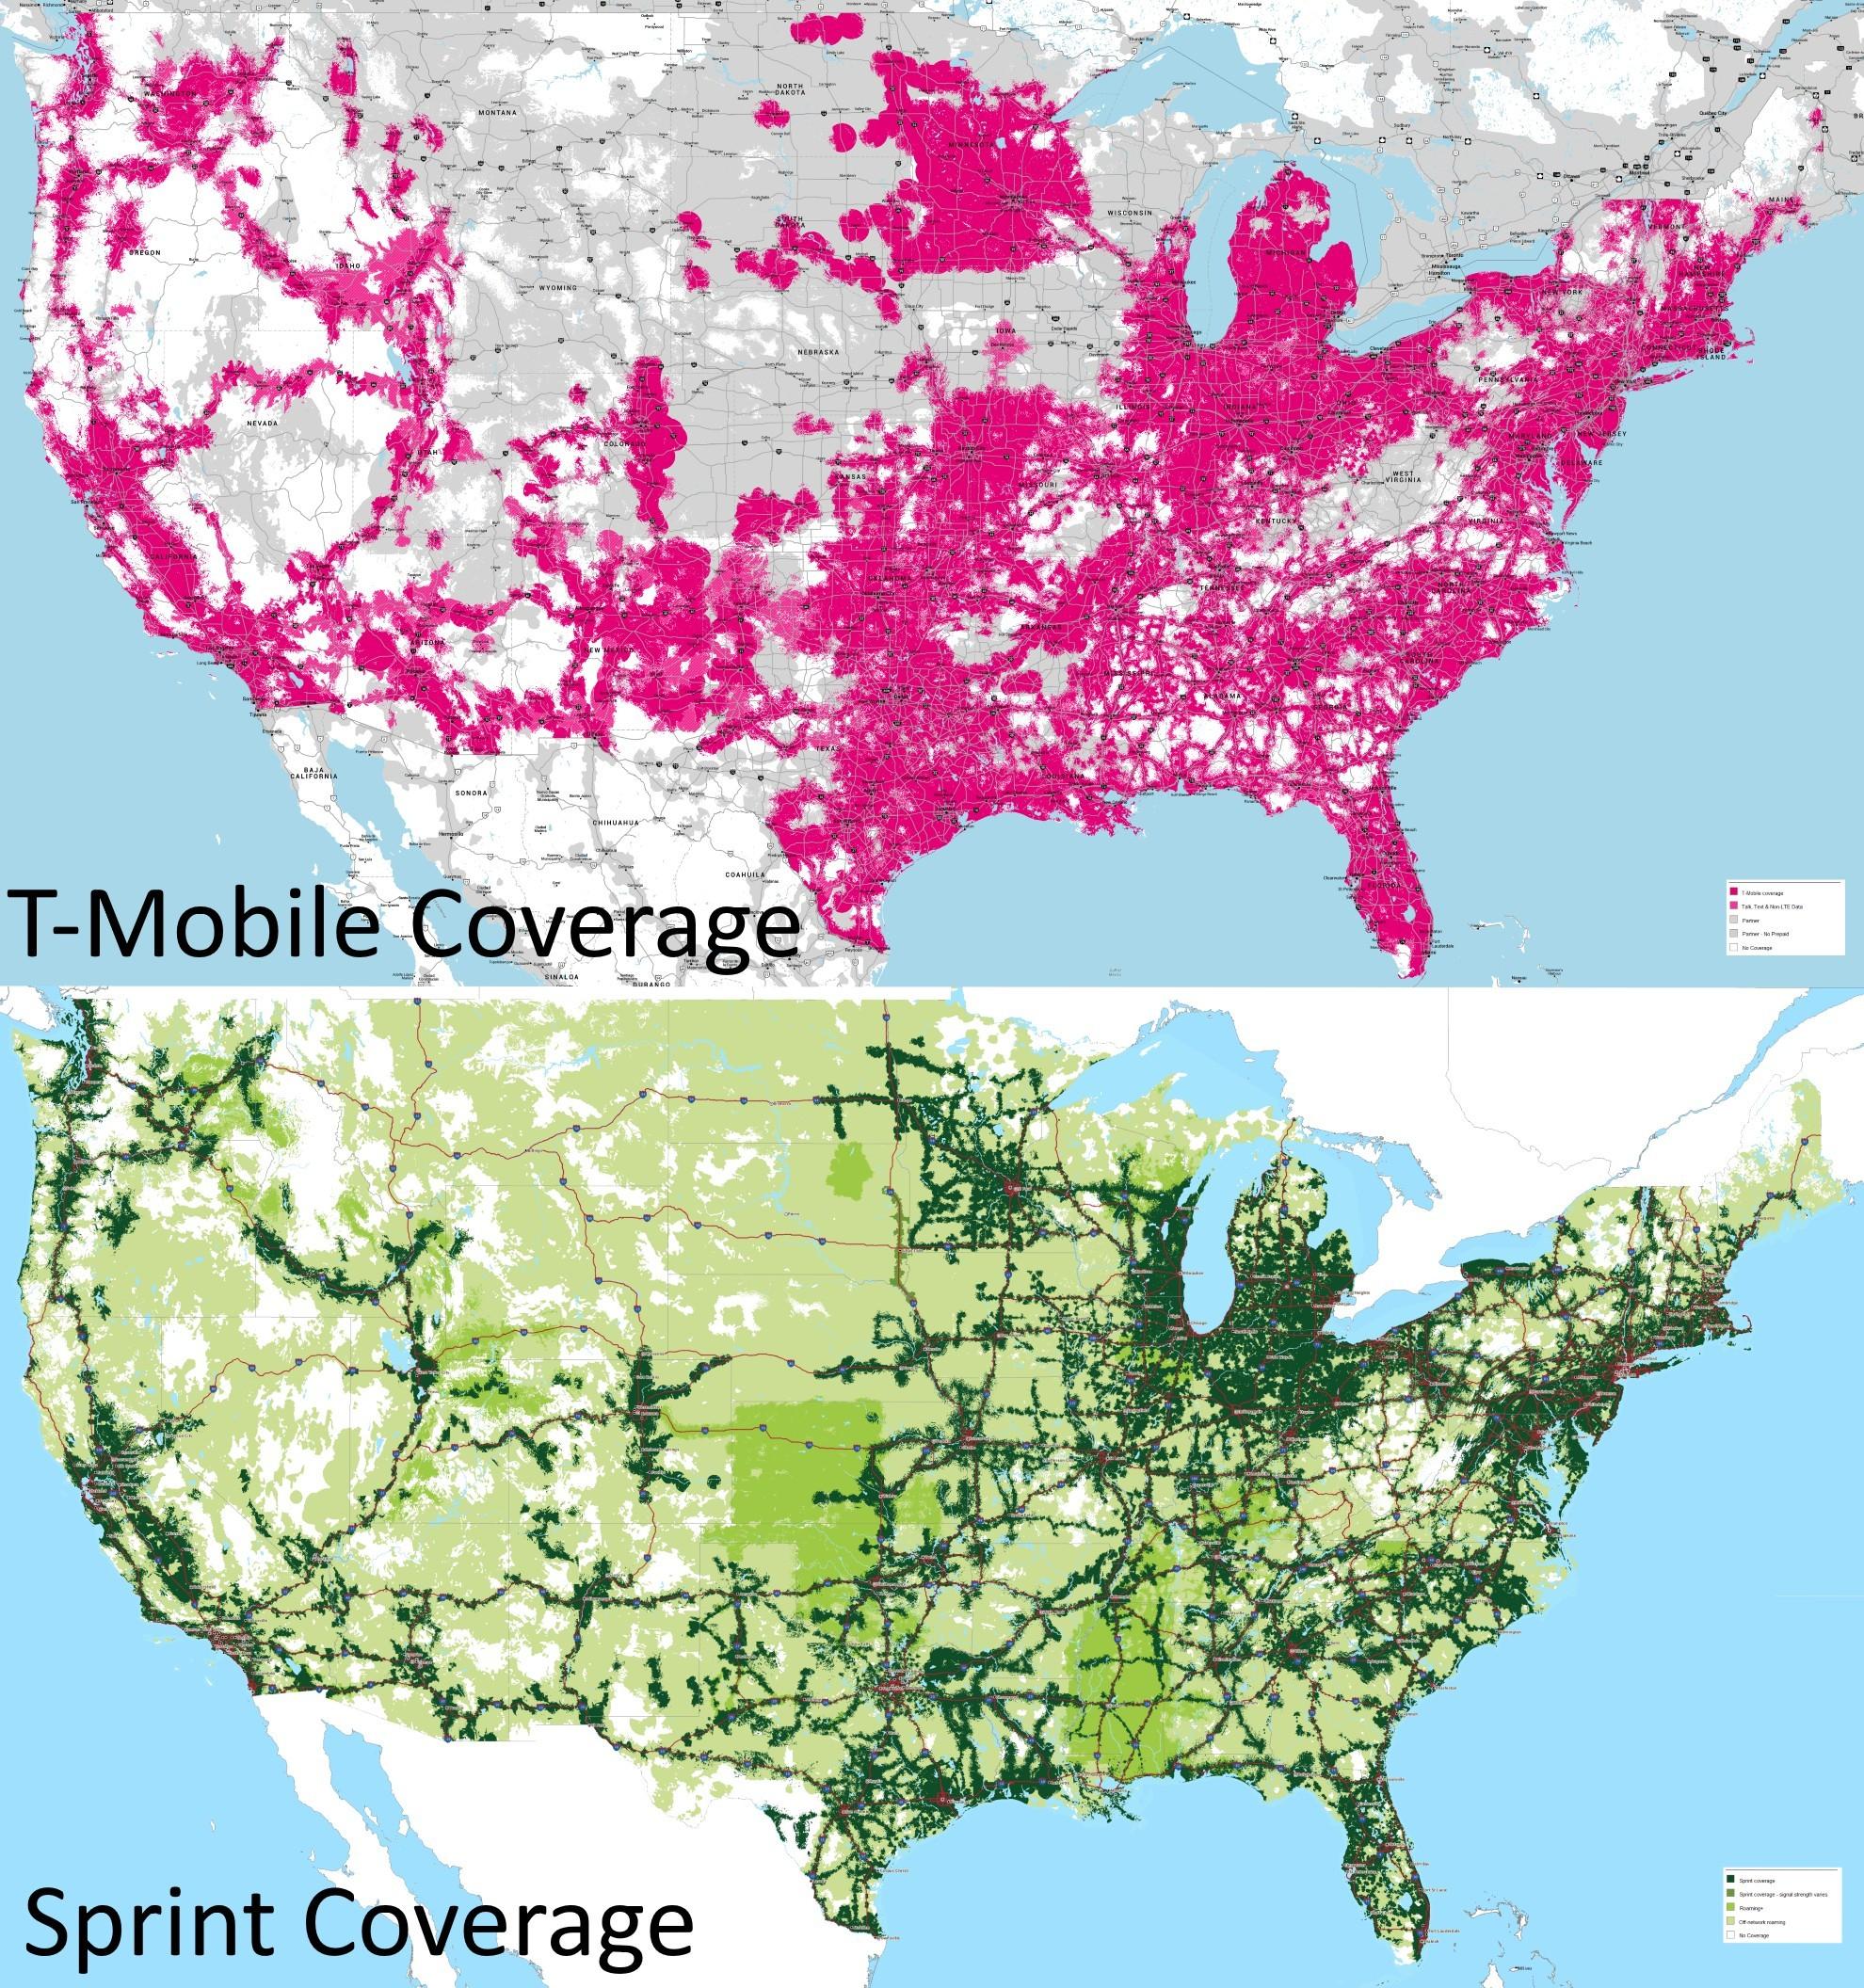 Sprint Us Coverage Map 2016 Sprintspectrumusmap Lovely Sprint - Sprint Coverage Map Florida